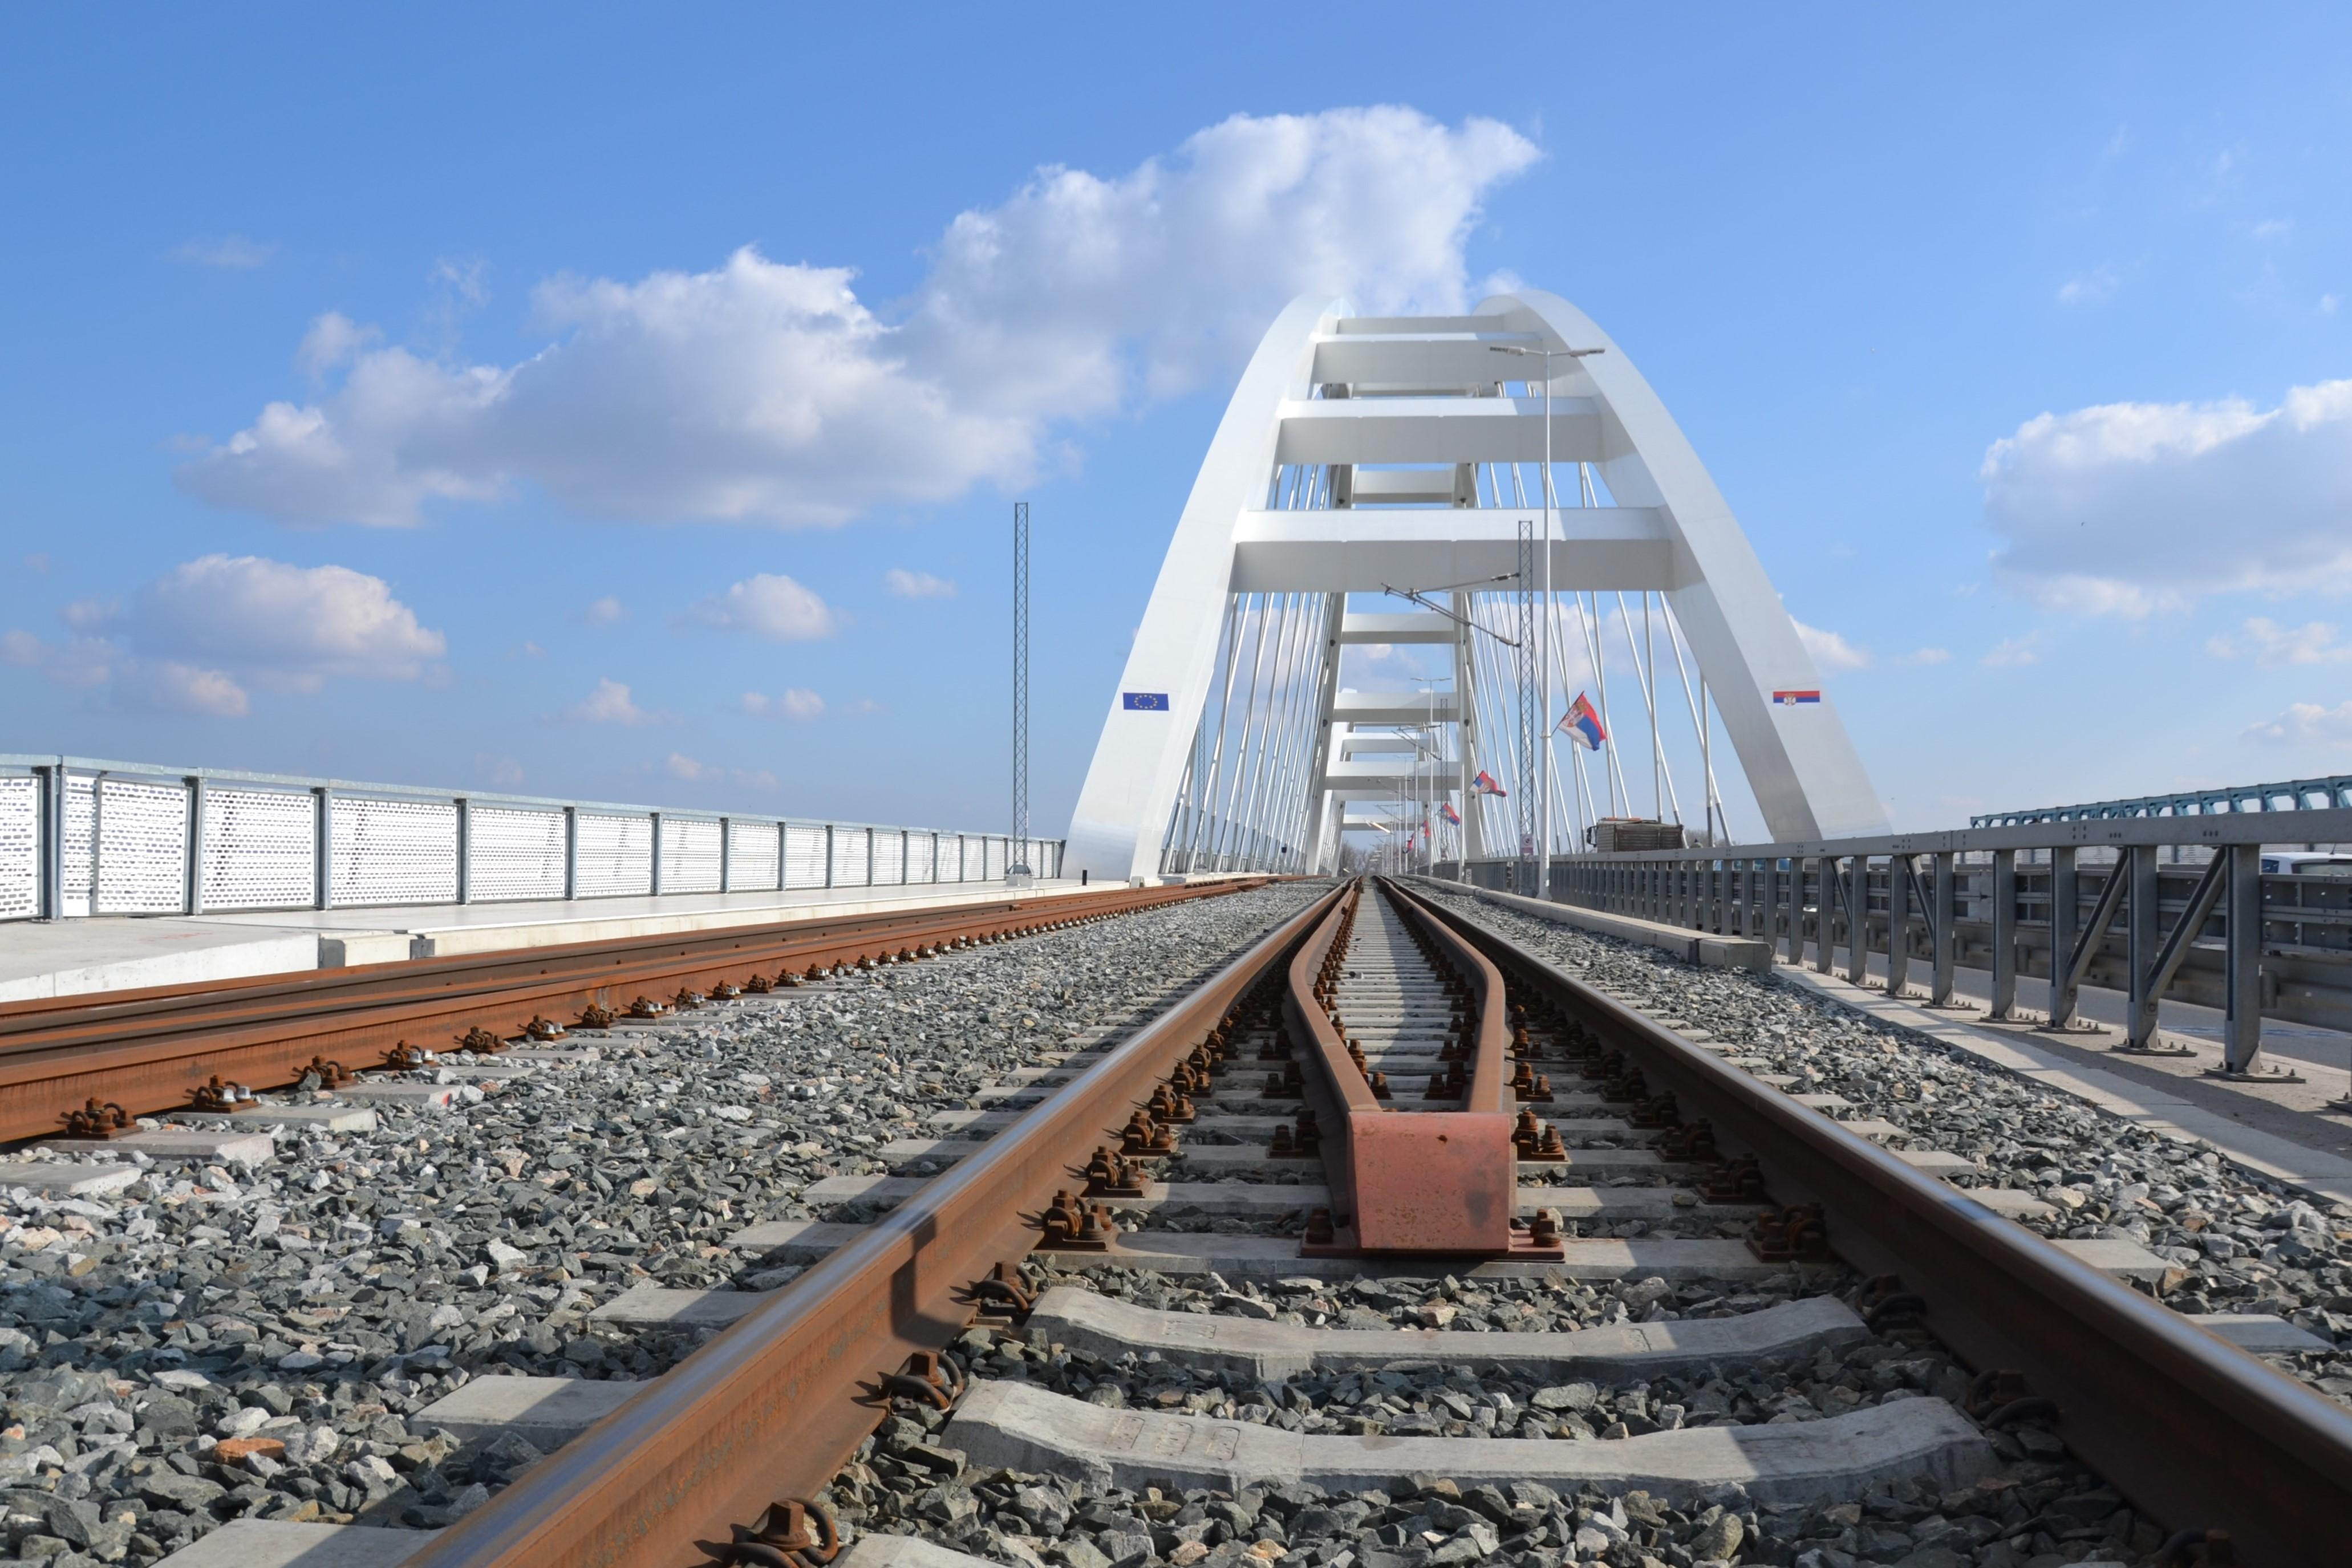 20190215-Brug Novi Sad (3), Servië, rail, railinfrastructuur, spoorlijn